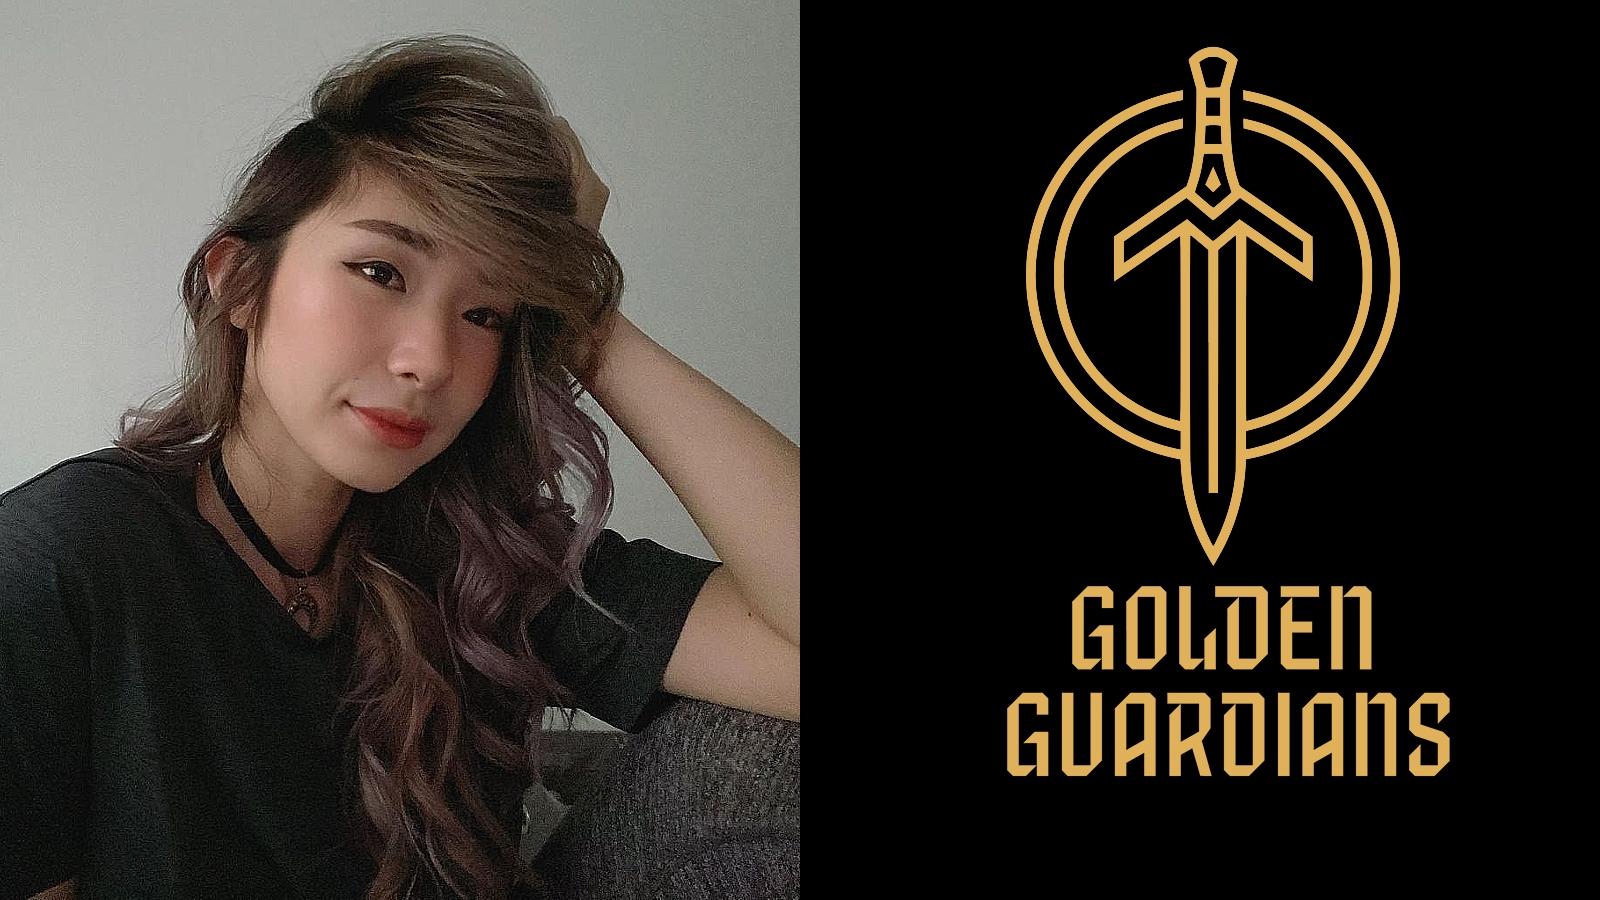 TSM president Leena says Golden Guardians not running org well